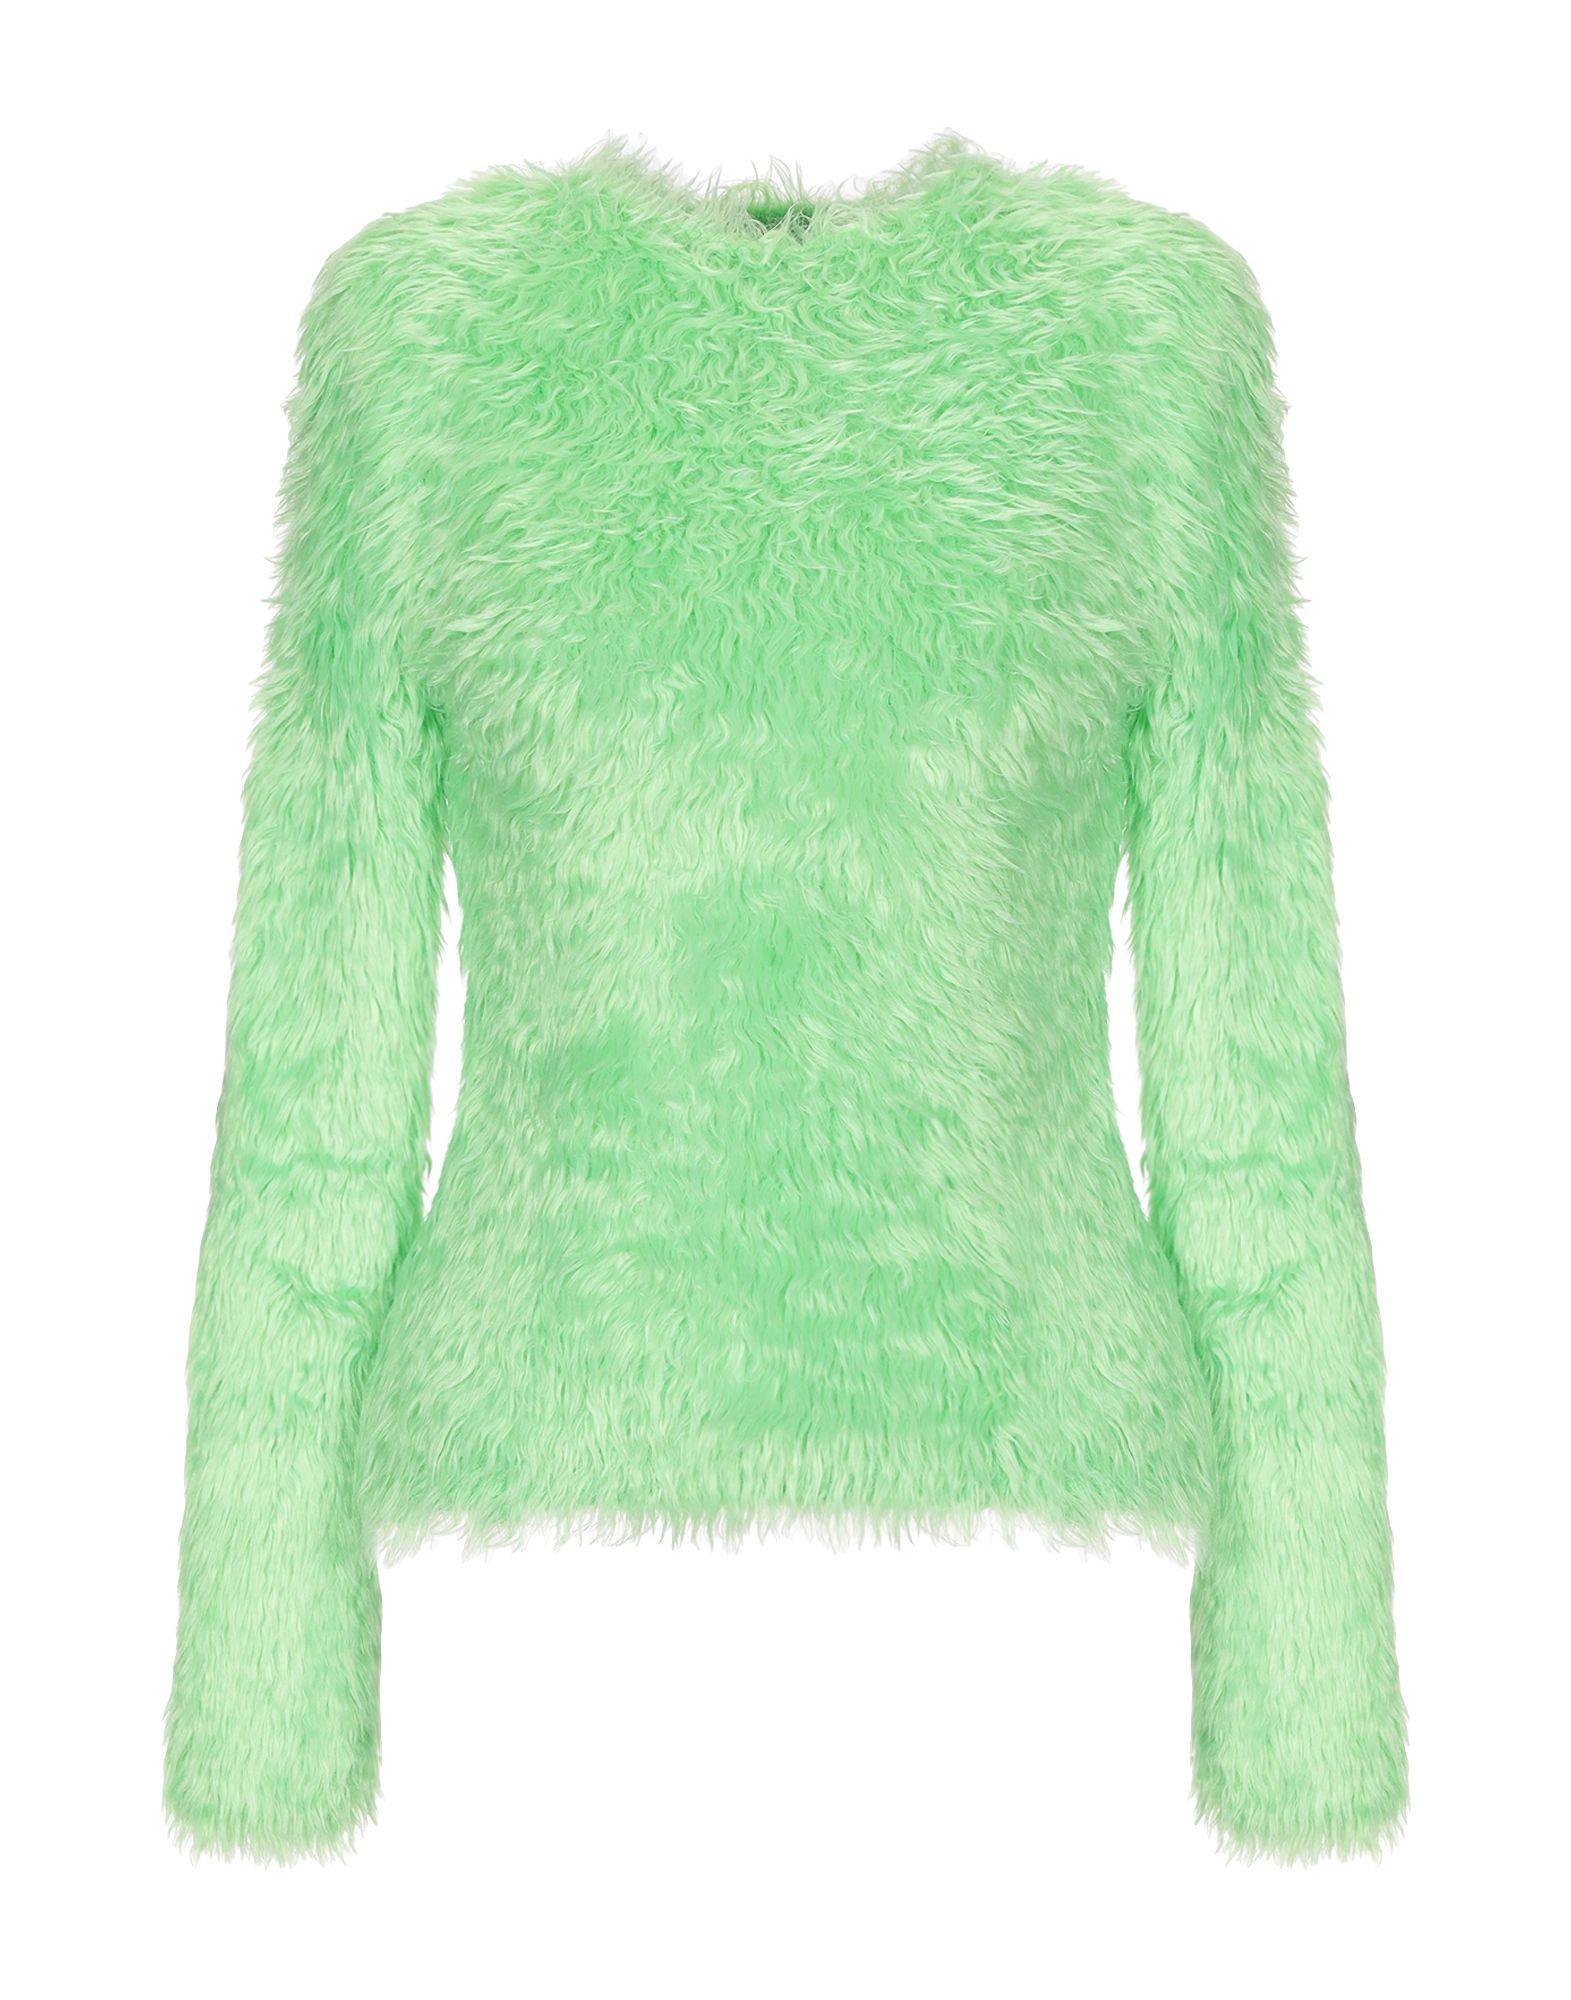 Balenciaga Crewneck Sweater In Neon